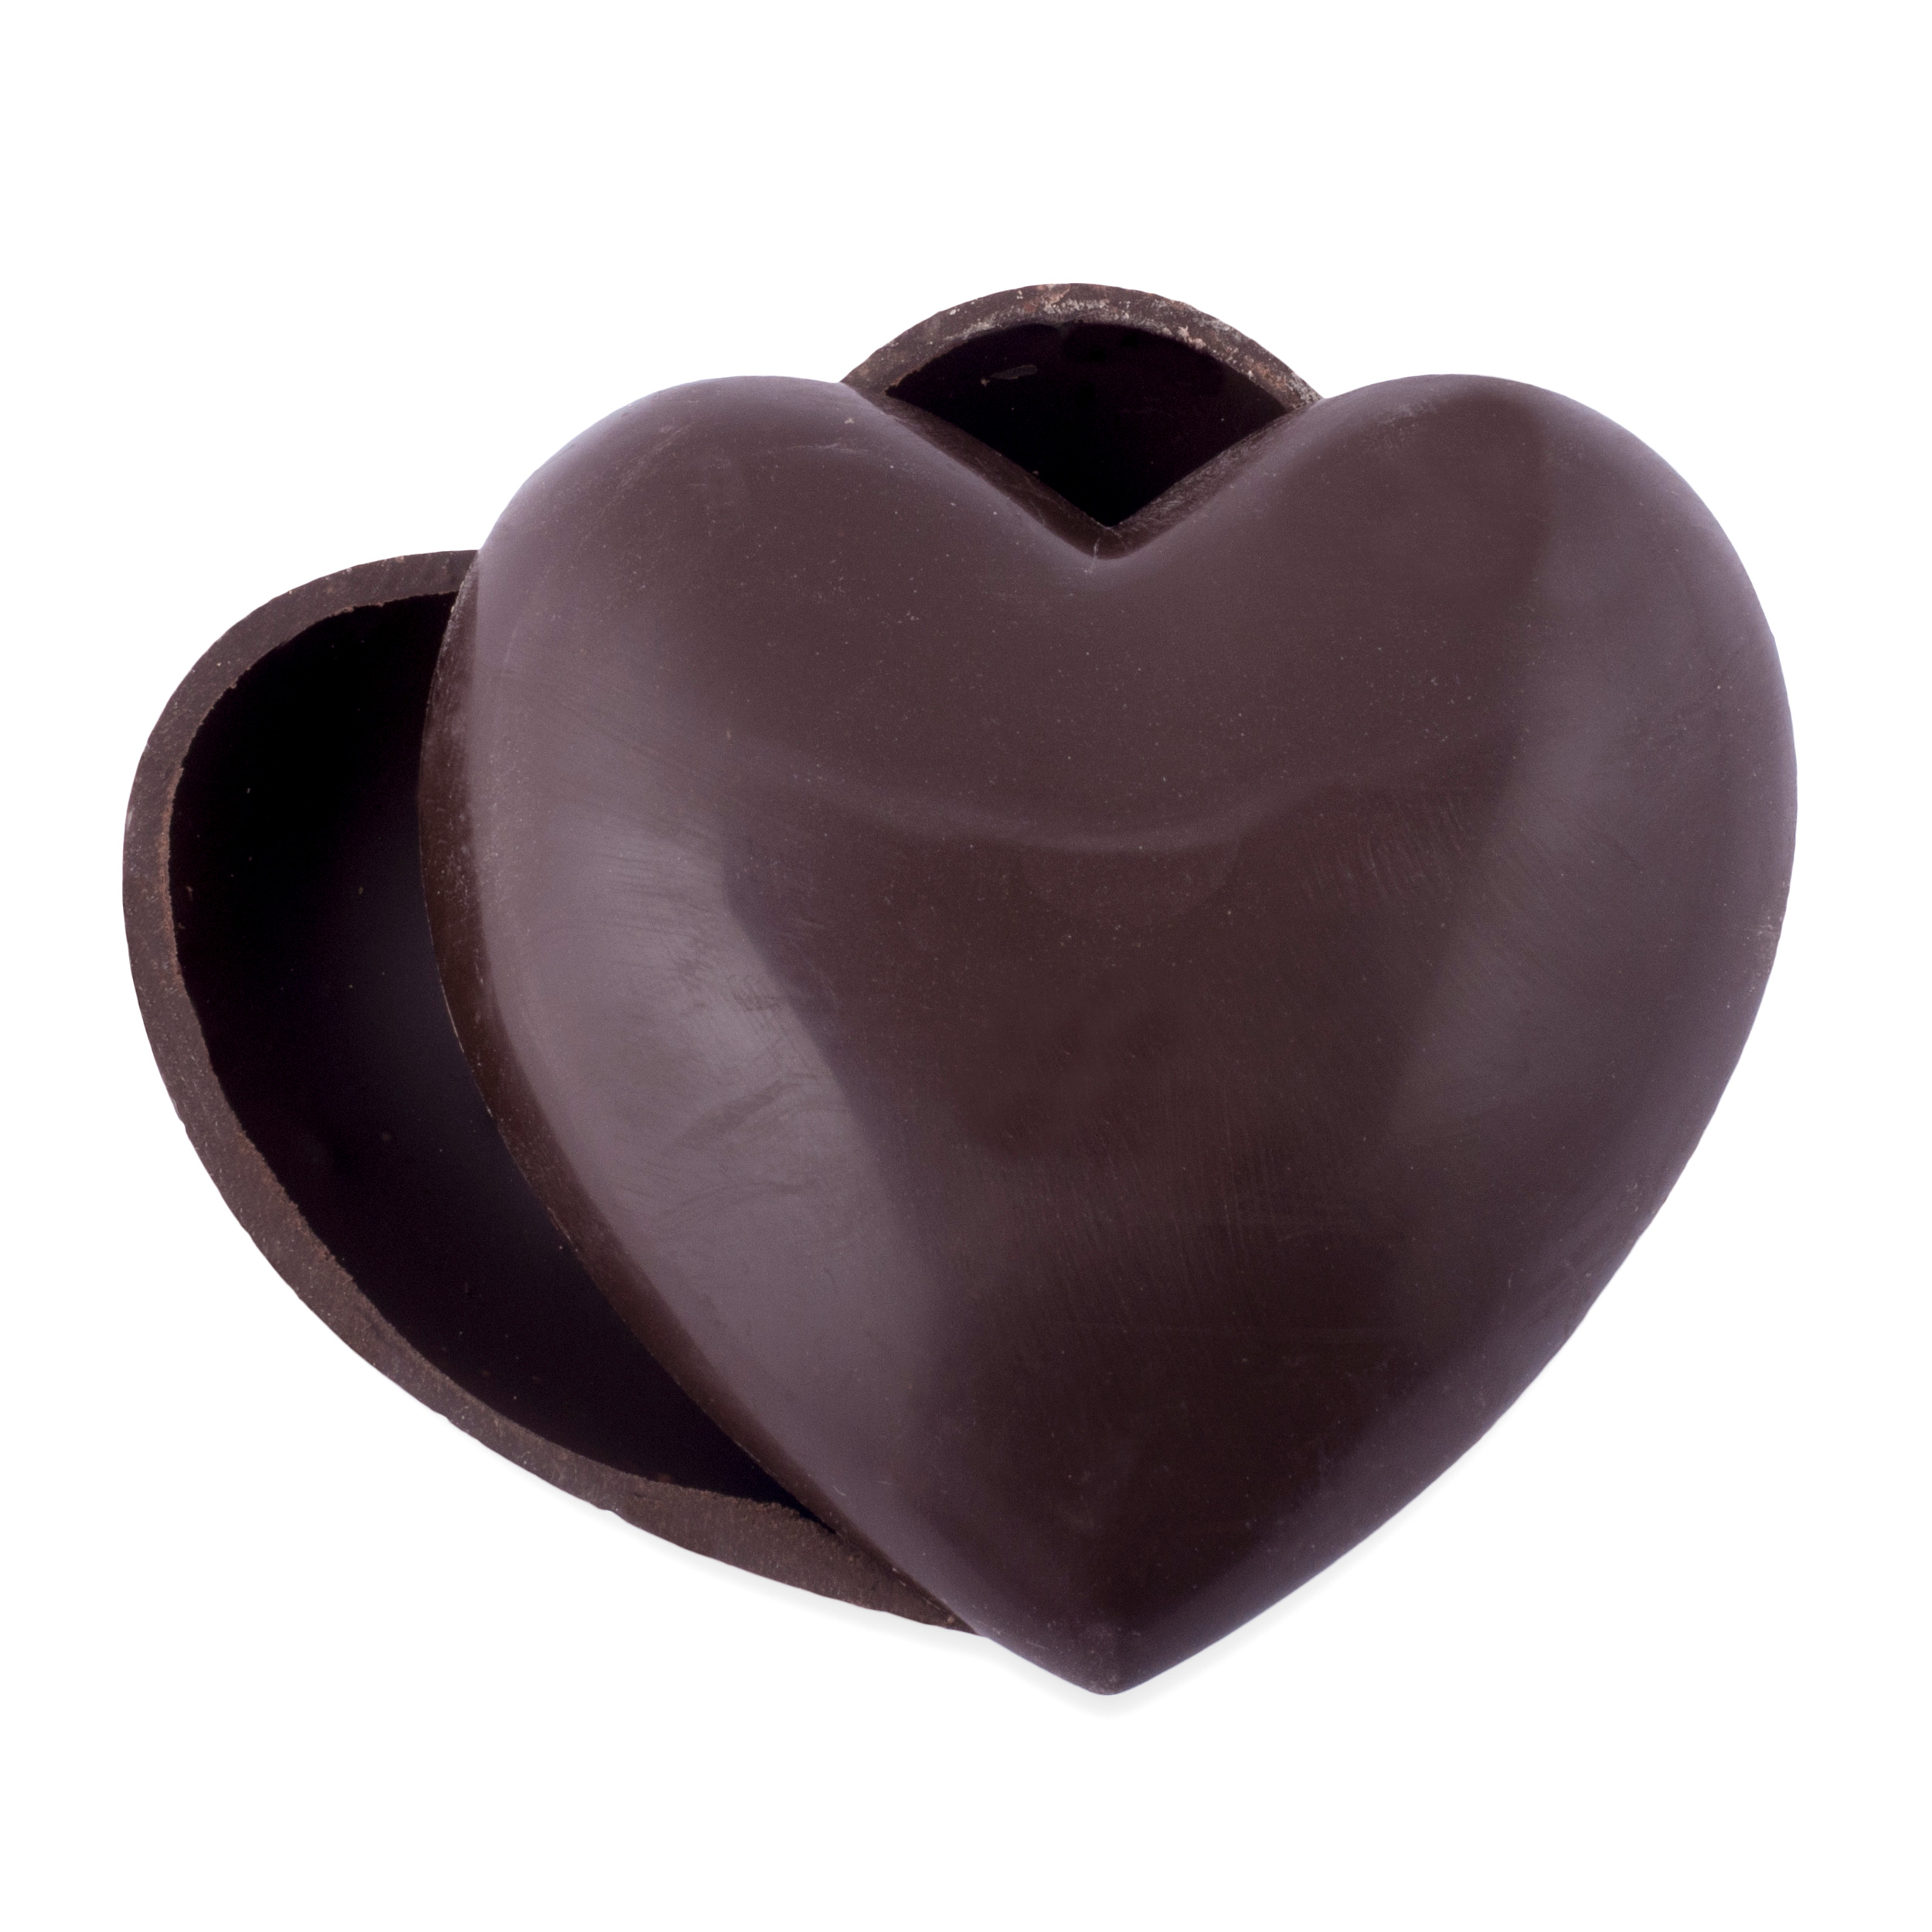 Chocolate Truffles In Heart Box